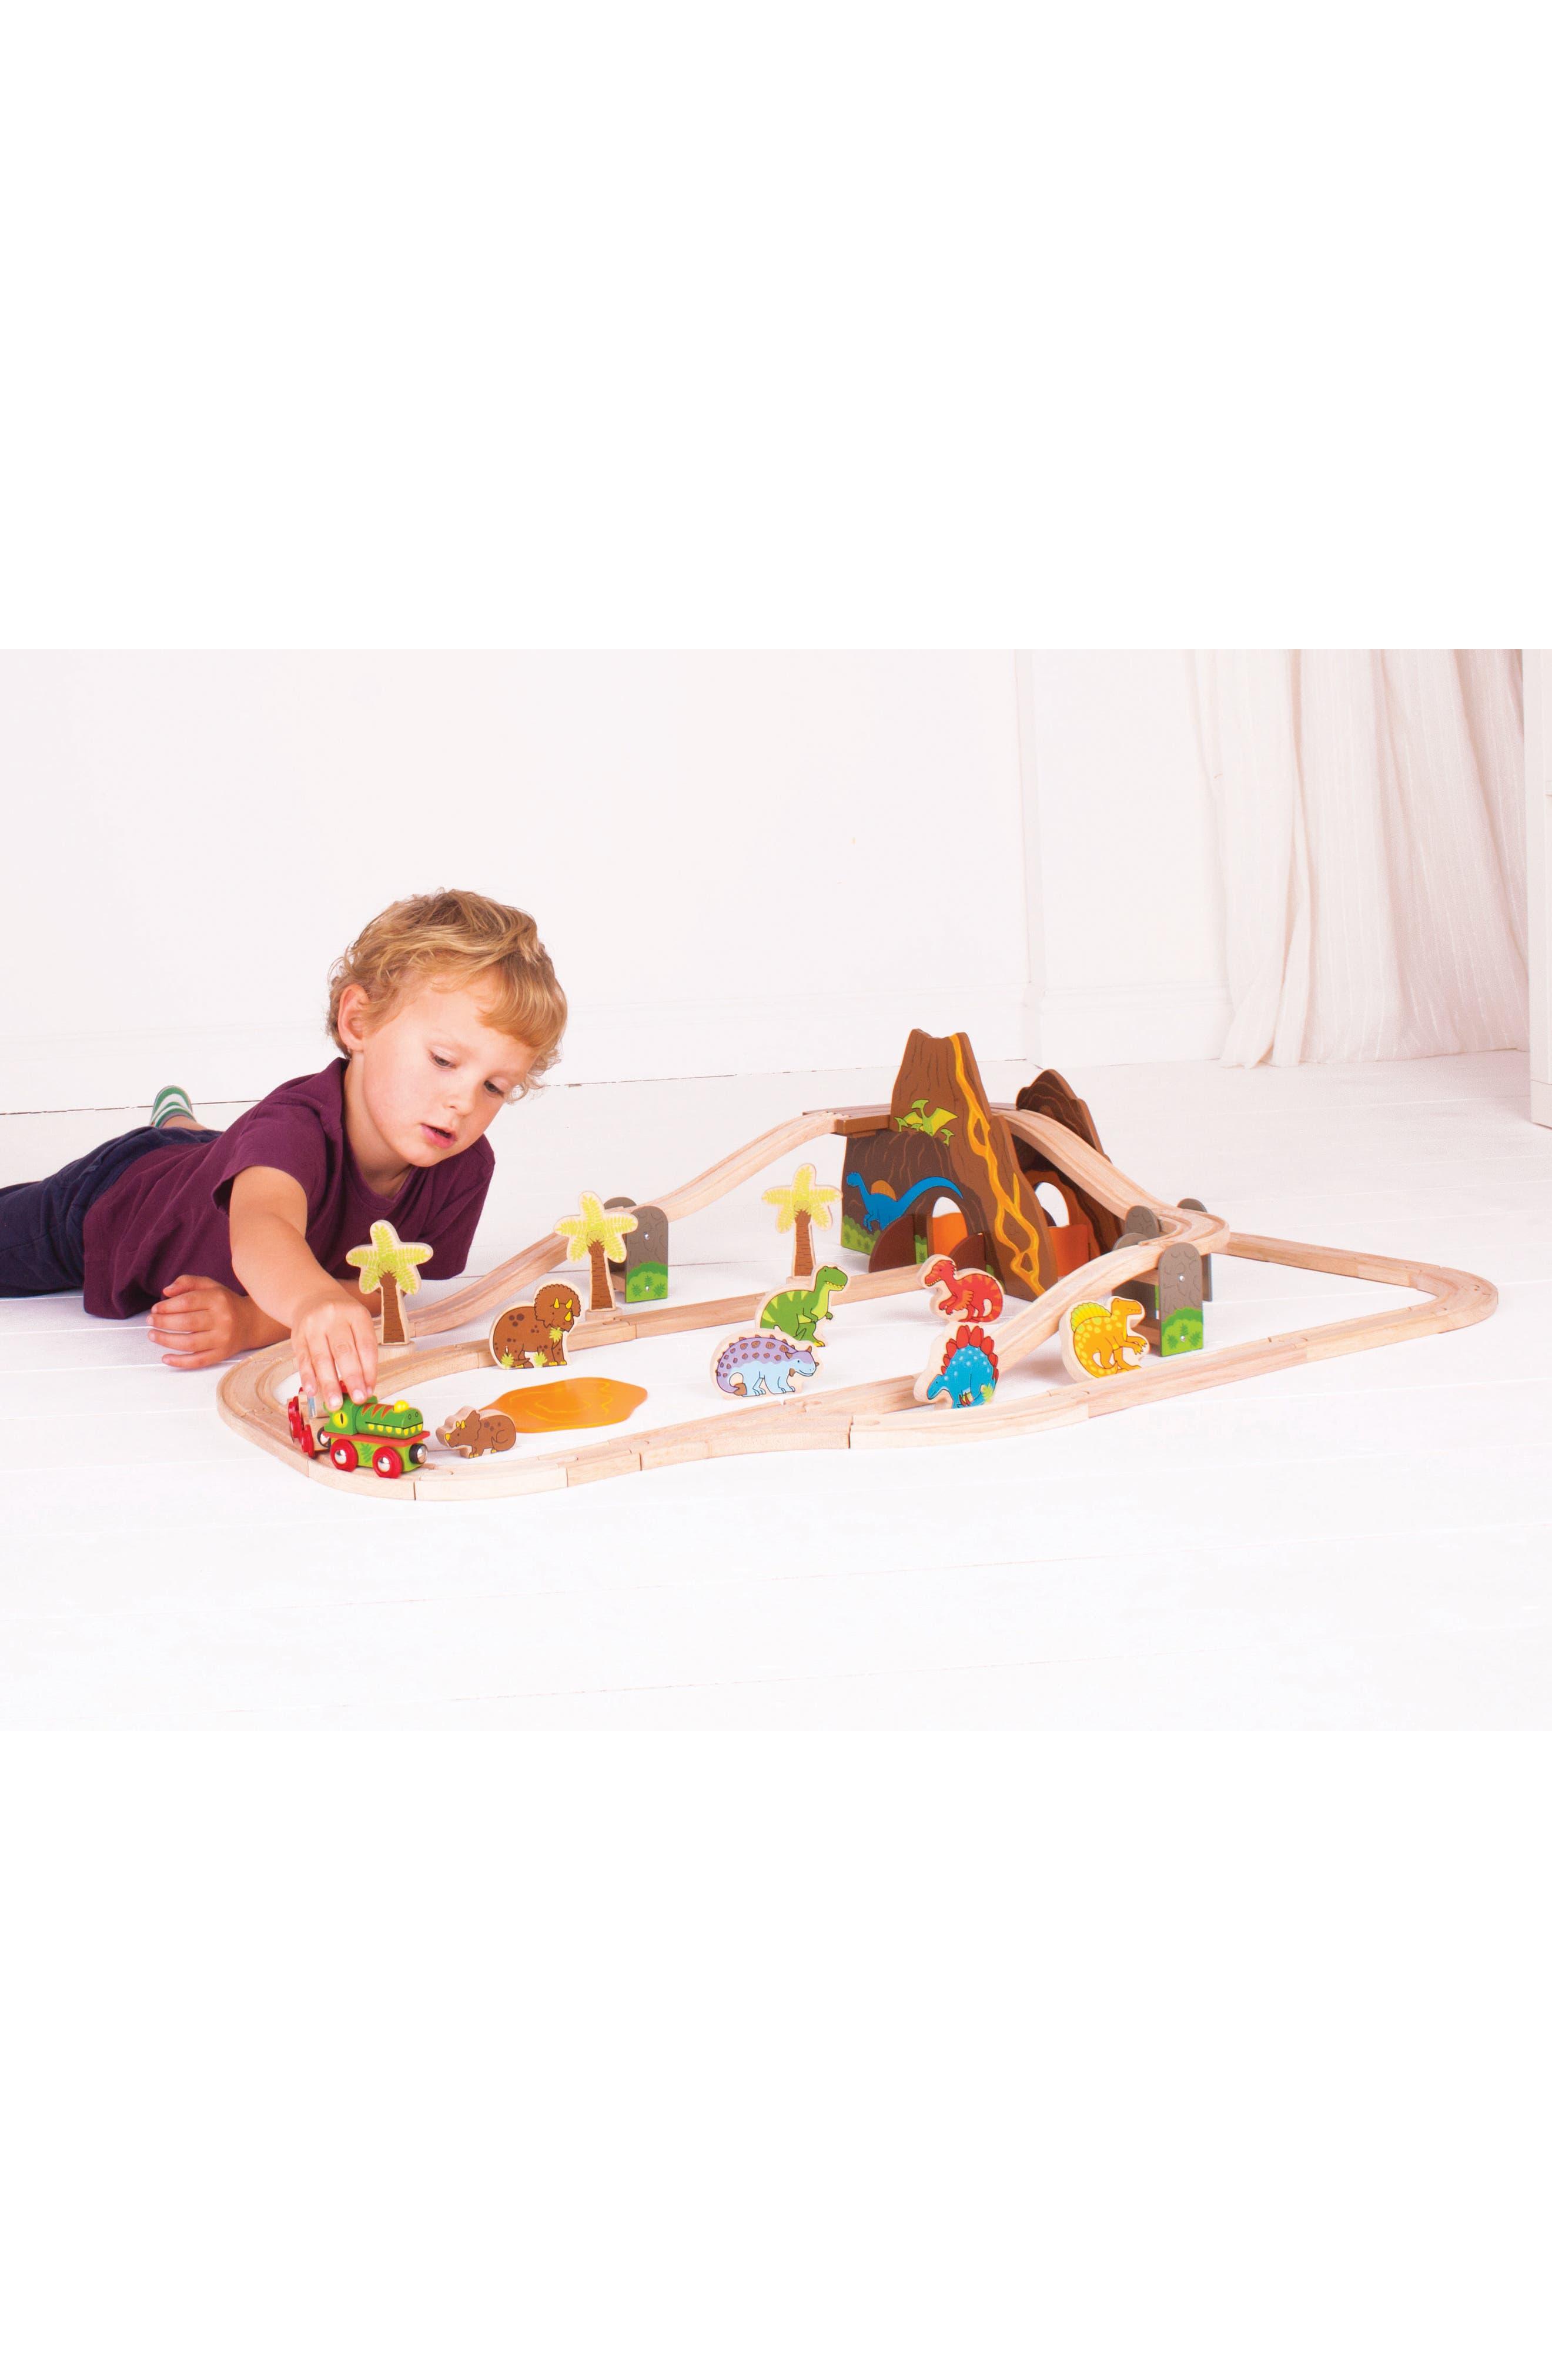 49-Piece Dinosaur Wooden Train Set,                             Alternate thumbnail 2, color,                             Brown